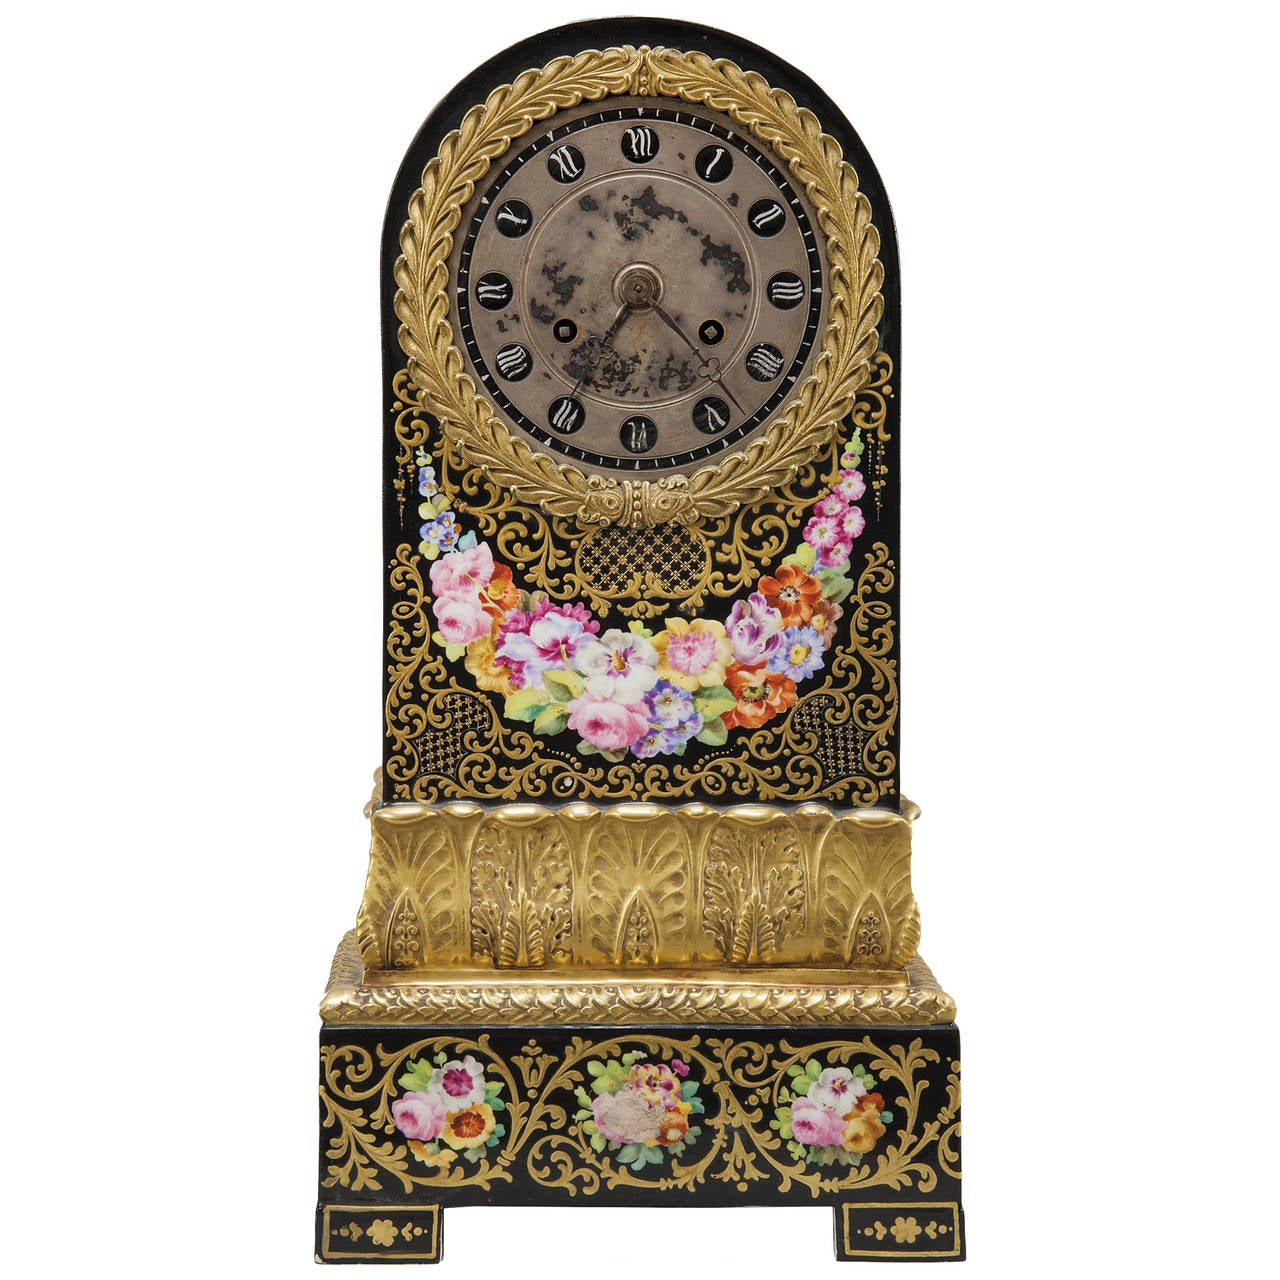 Charles X Period Ormolu Mounted Jacob Petit Porcelain Mantel Clock